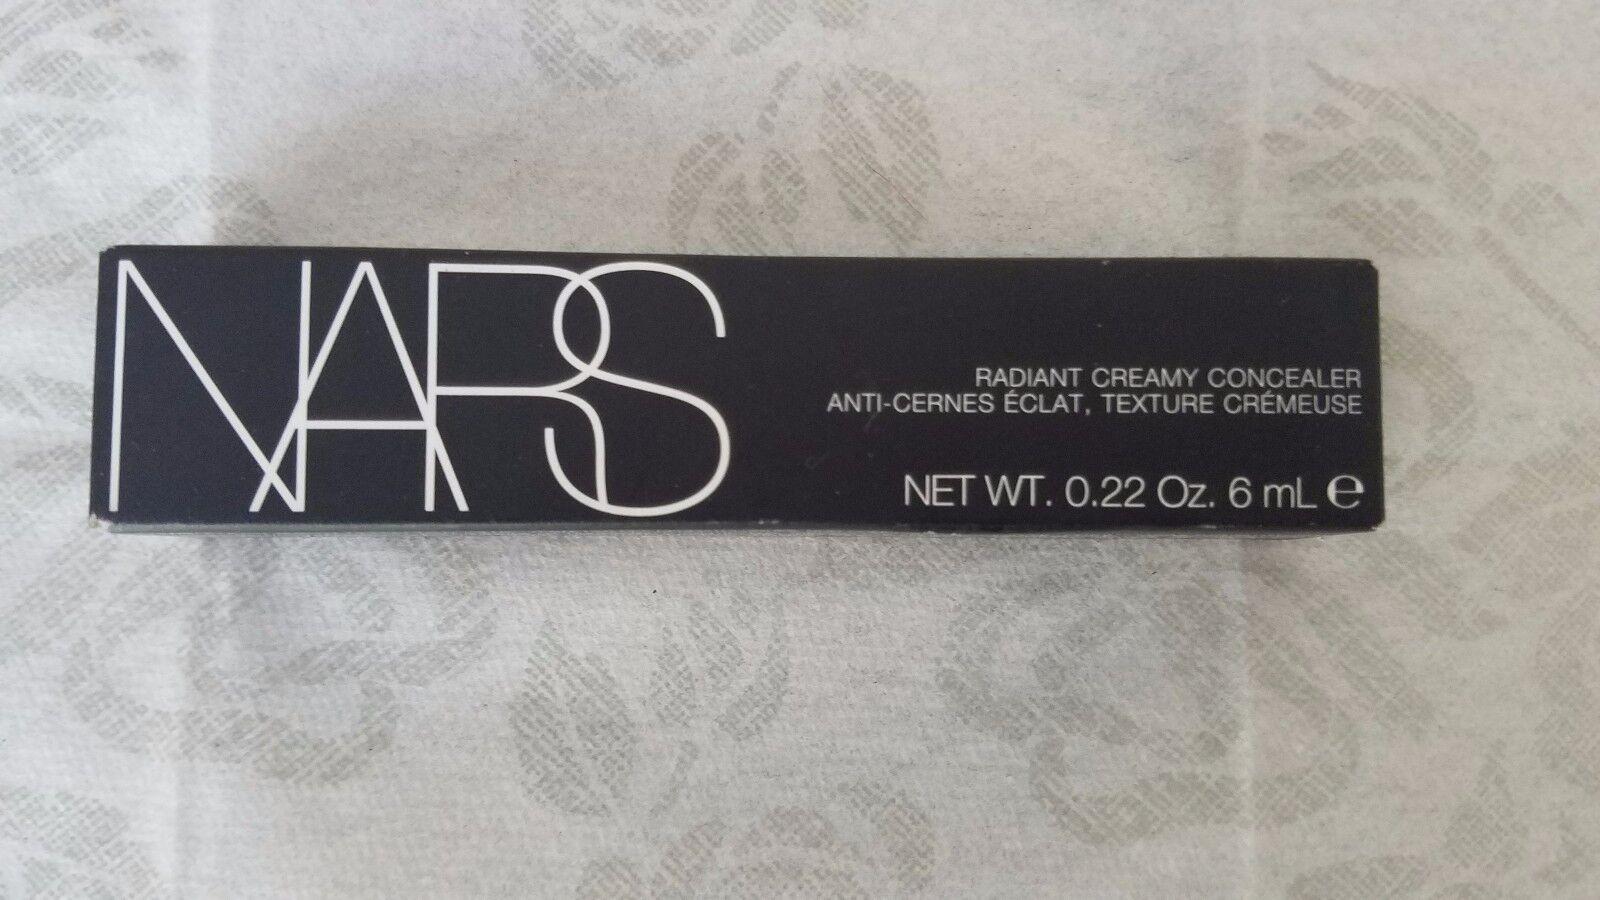 Radiant Creamy Nars Concealer Medium 1 Custard 5afda Ebay